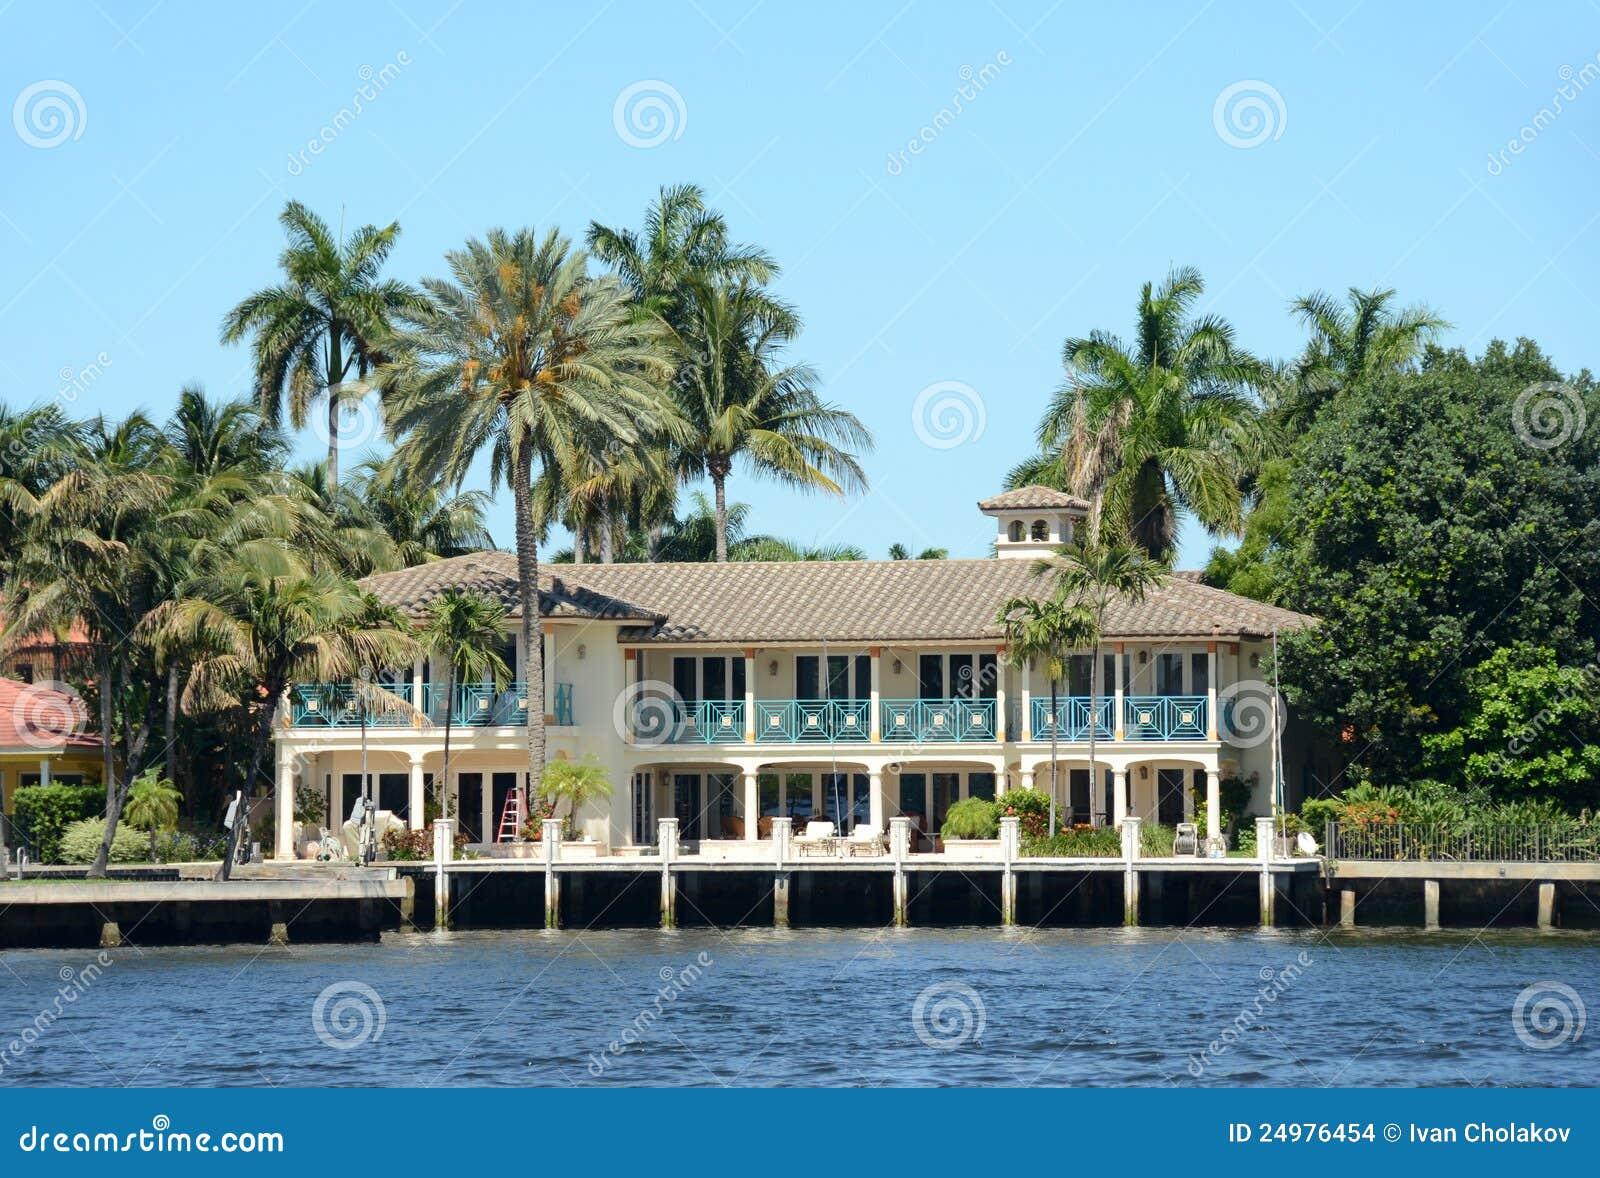 Luxury waterfront home in florida stock images image - Maison au bord de la mer ...